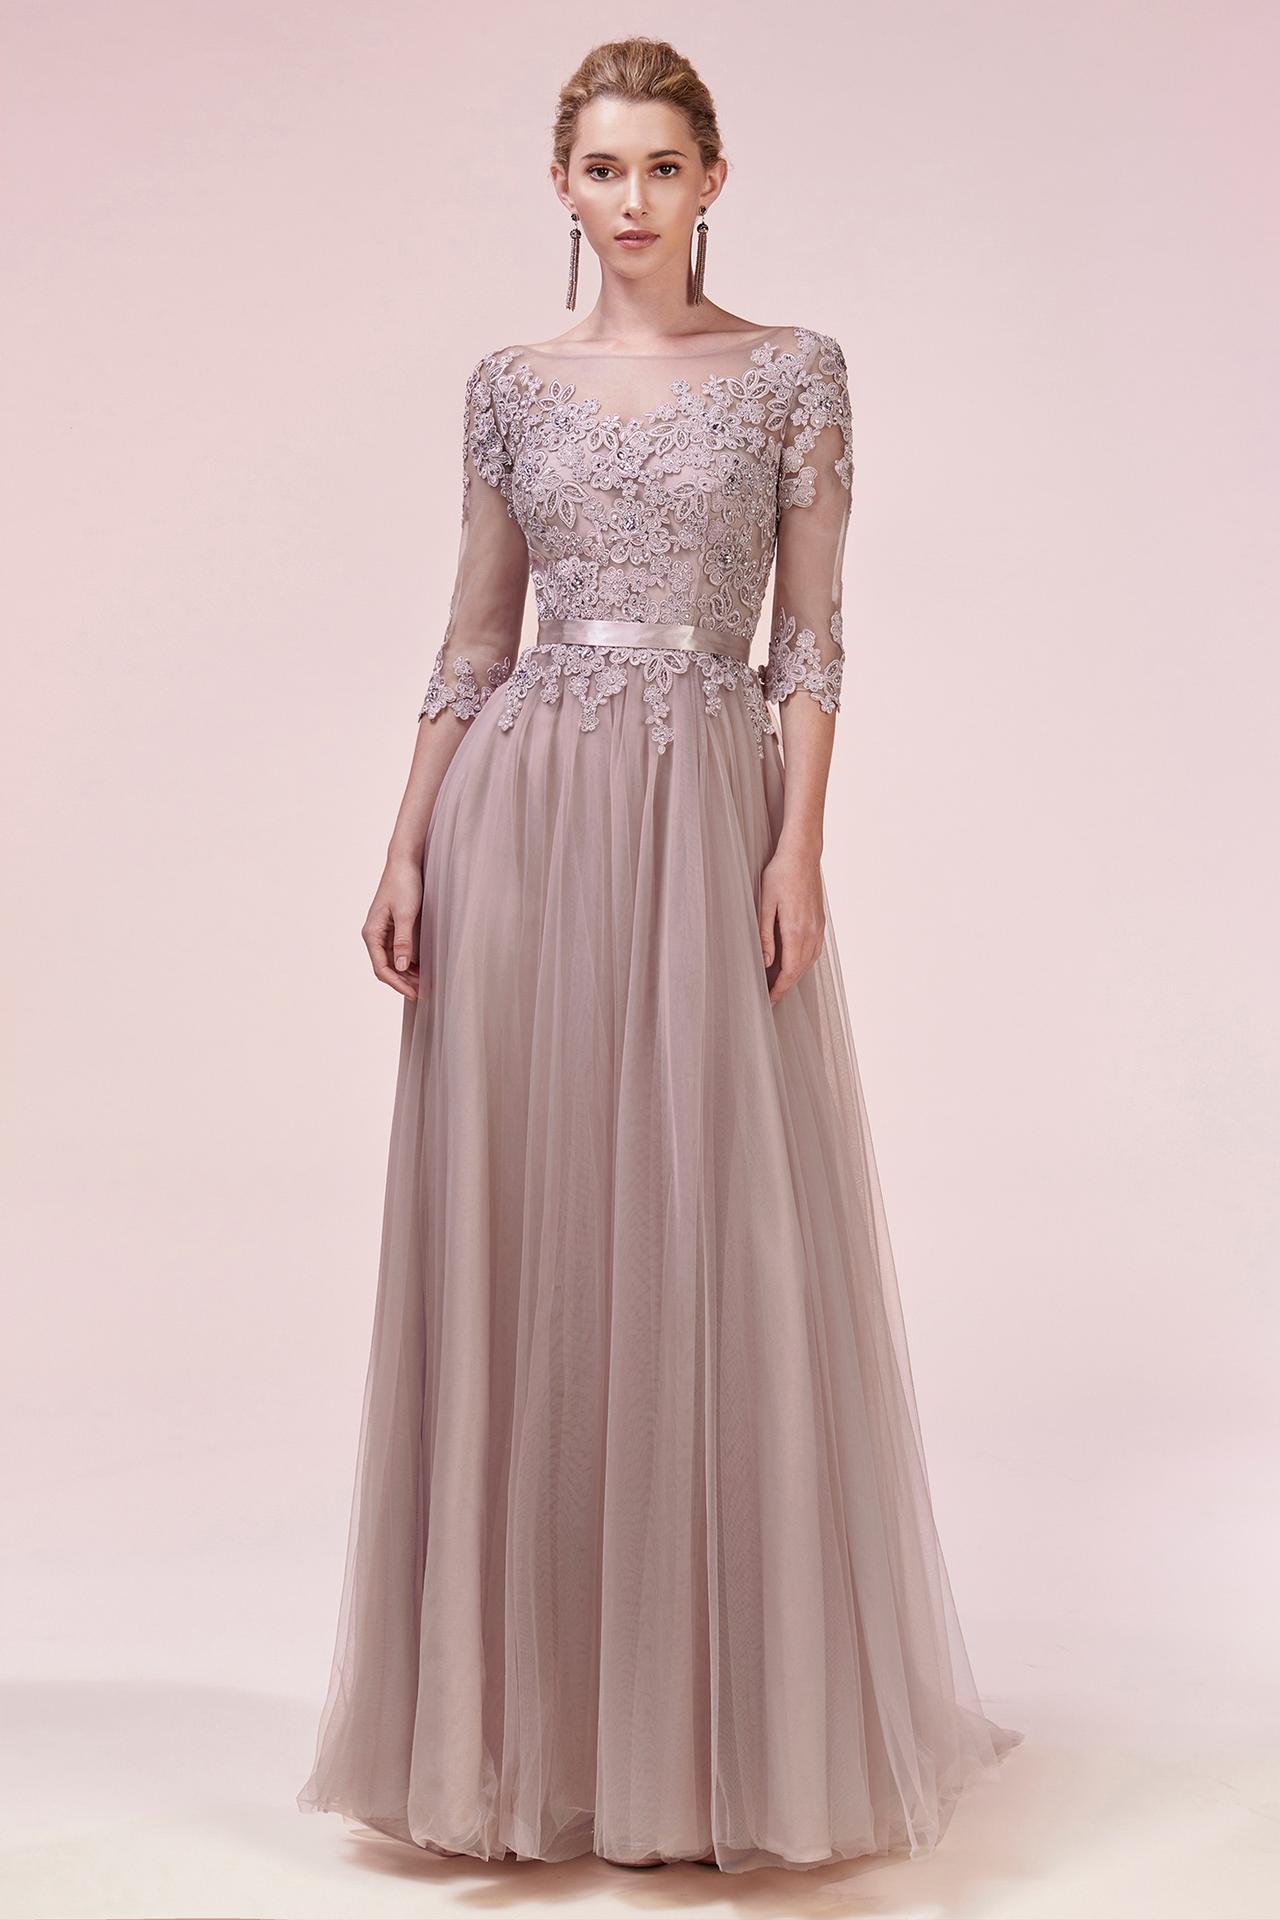 Nové spoločenské šaty :) - Obrázok č. 26